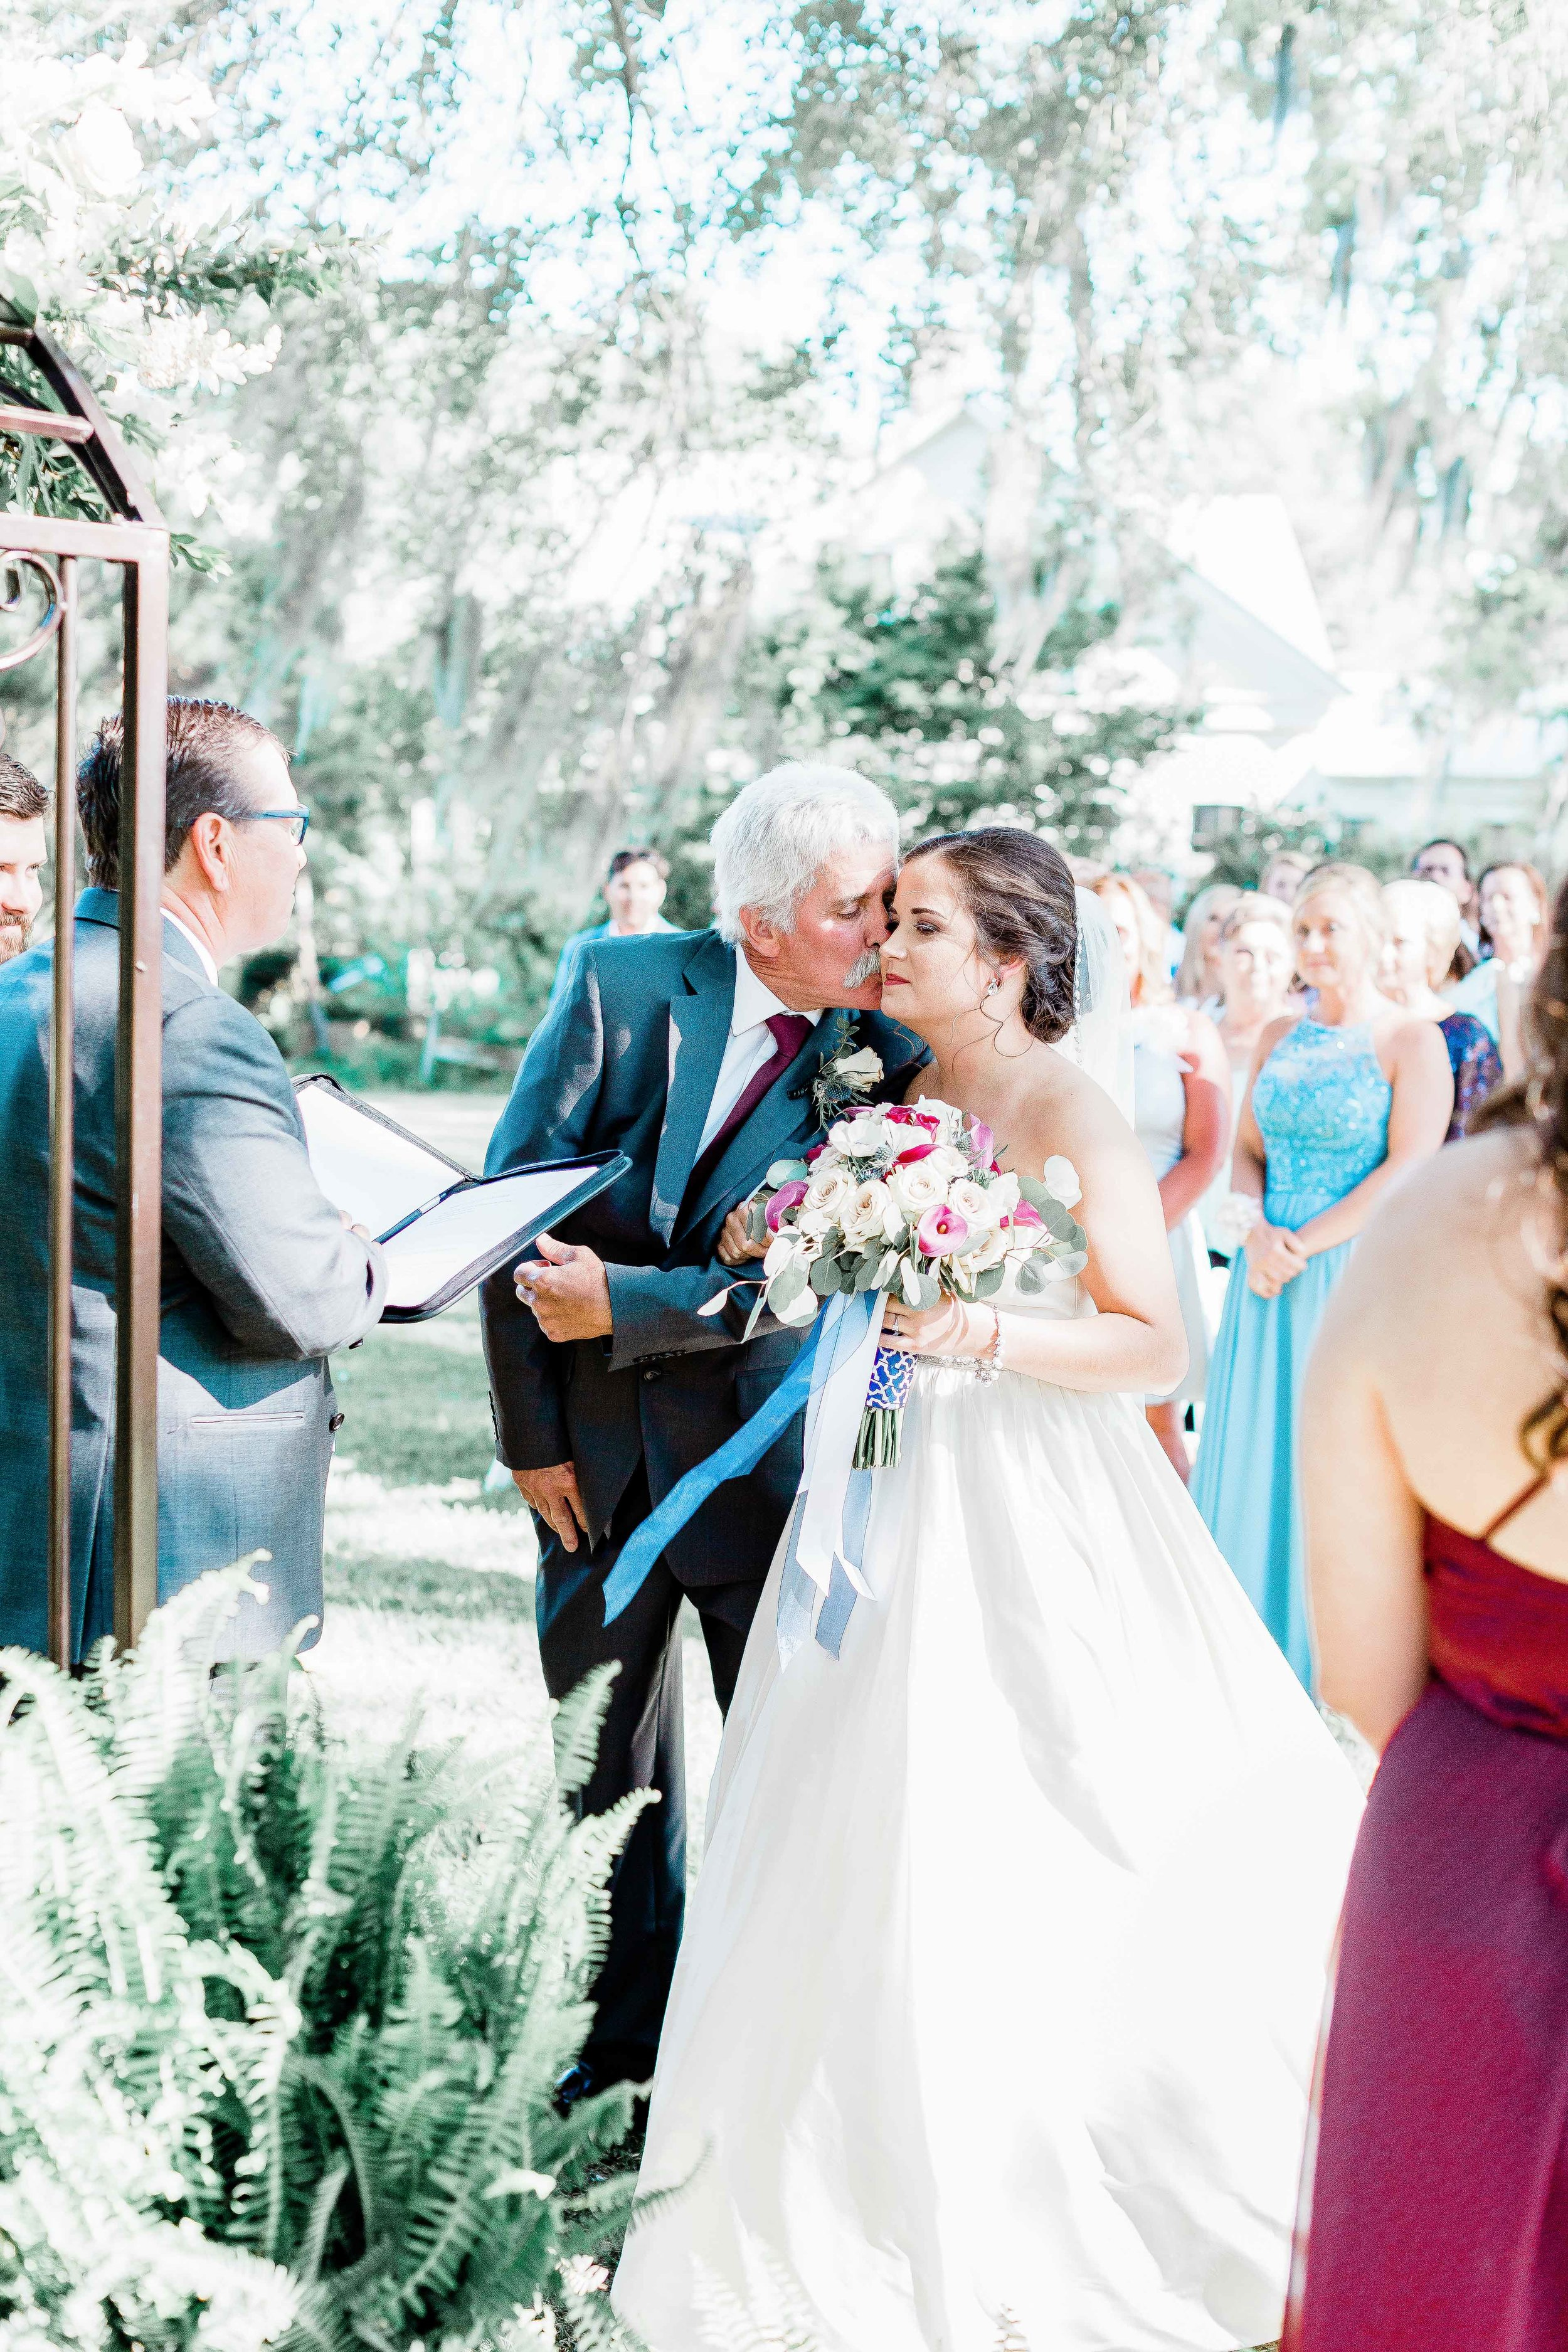 20190427-Southern Lens Photography- Savannah Wedding Photographer-Screven and Caroline-201993.jpg